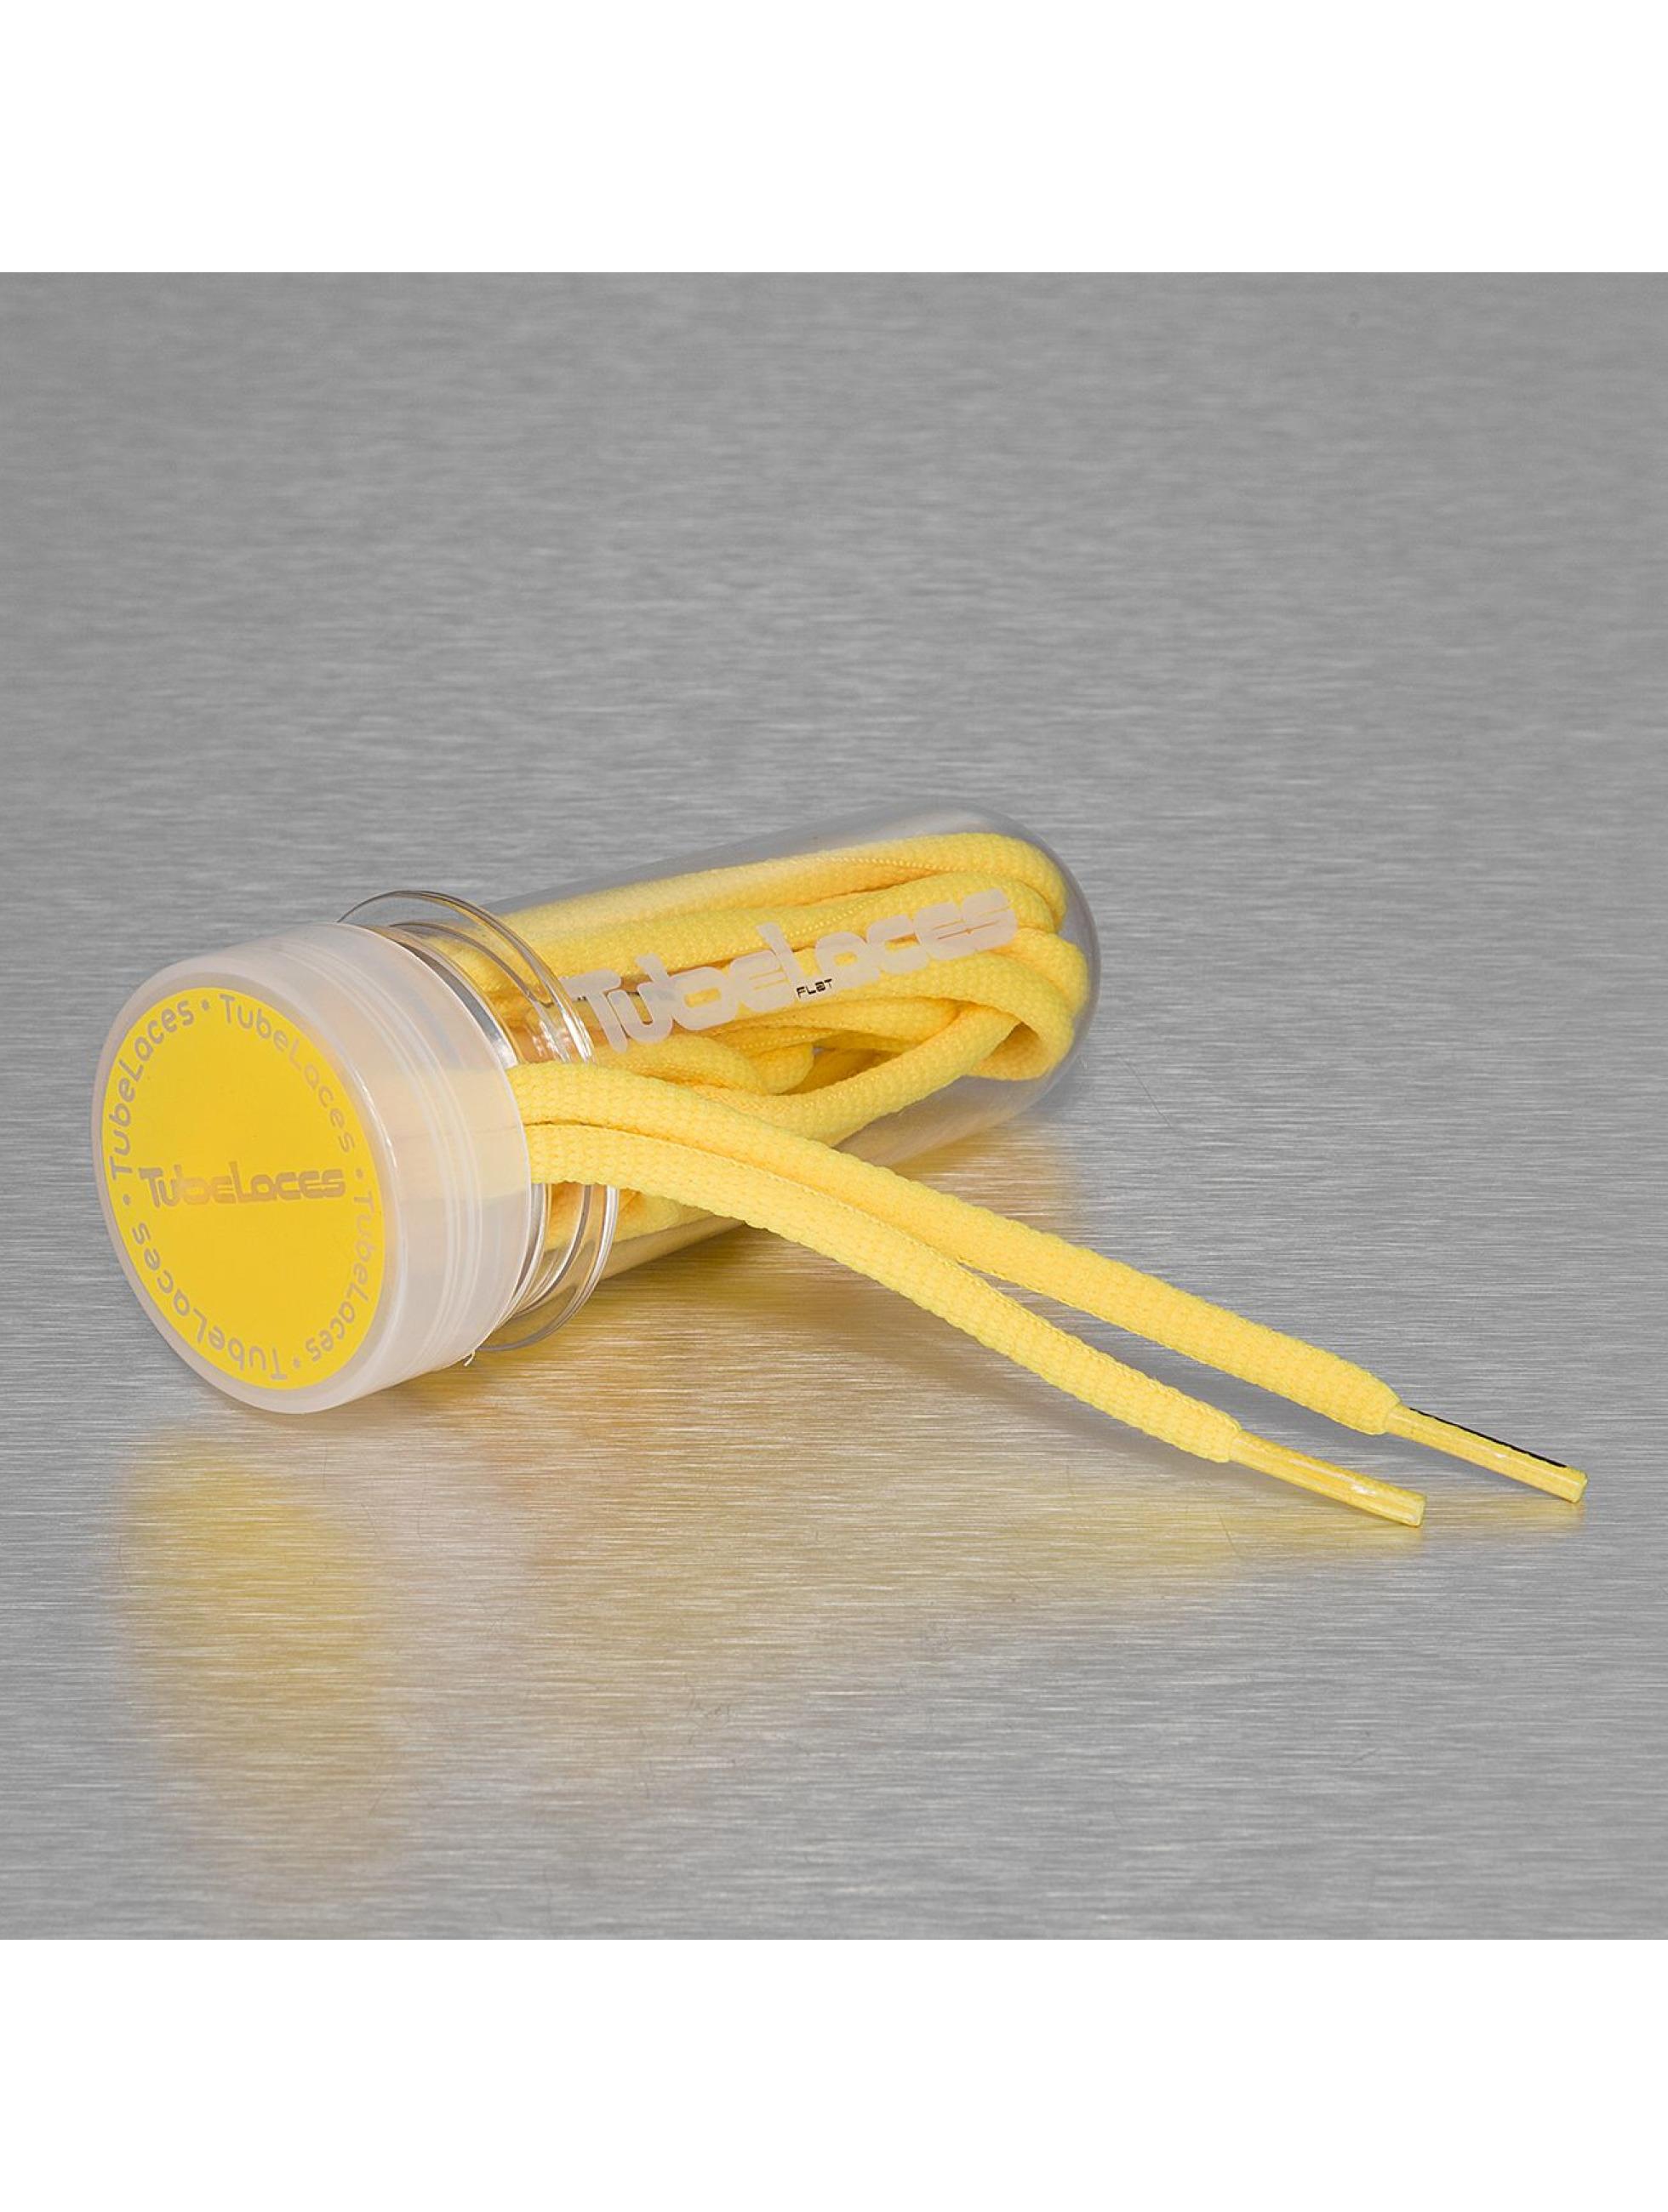 Tubelaces Schuhzubehör Pad Laces 130cm gelb